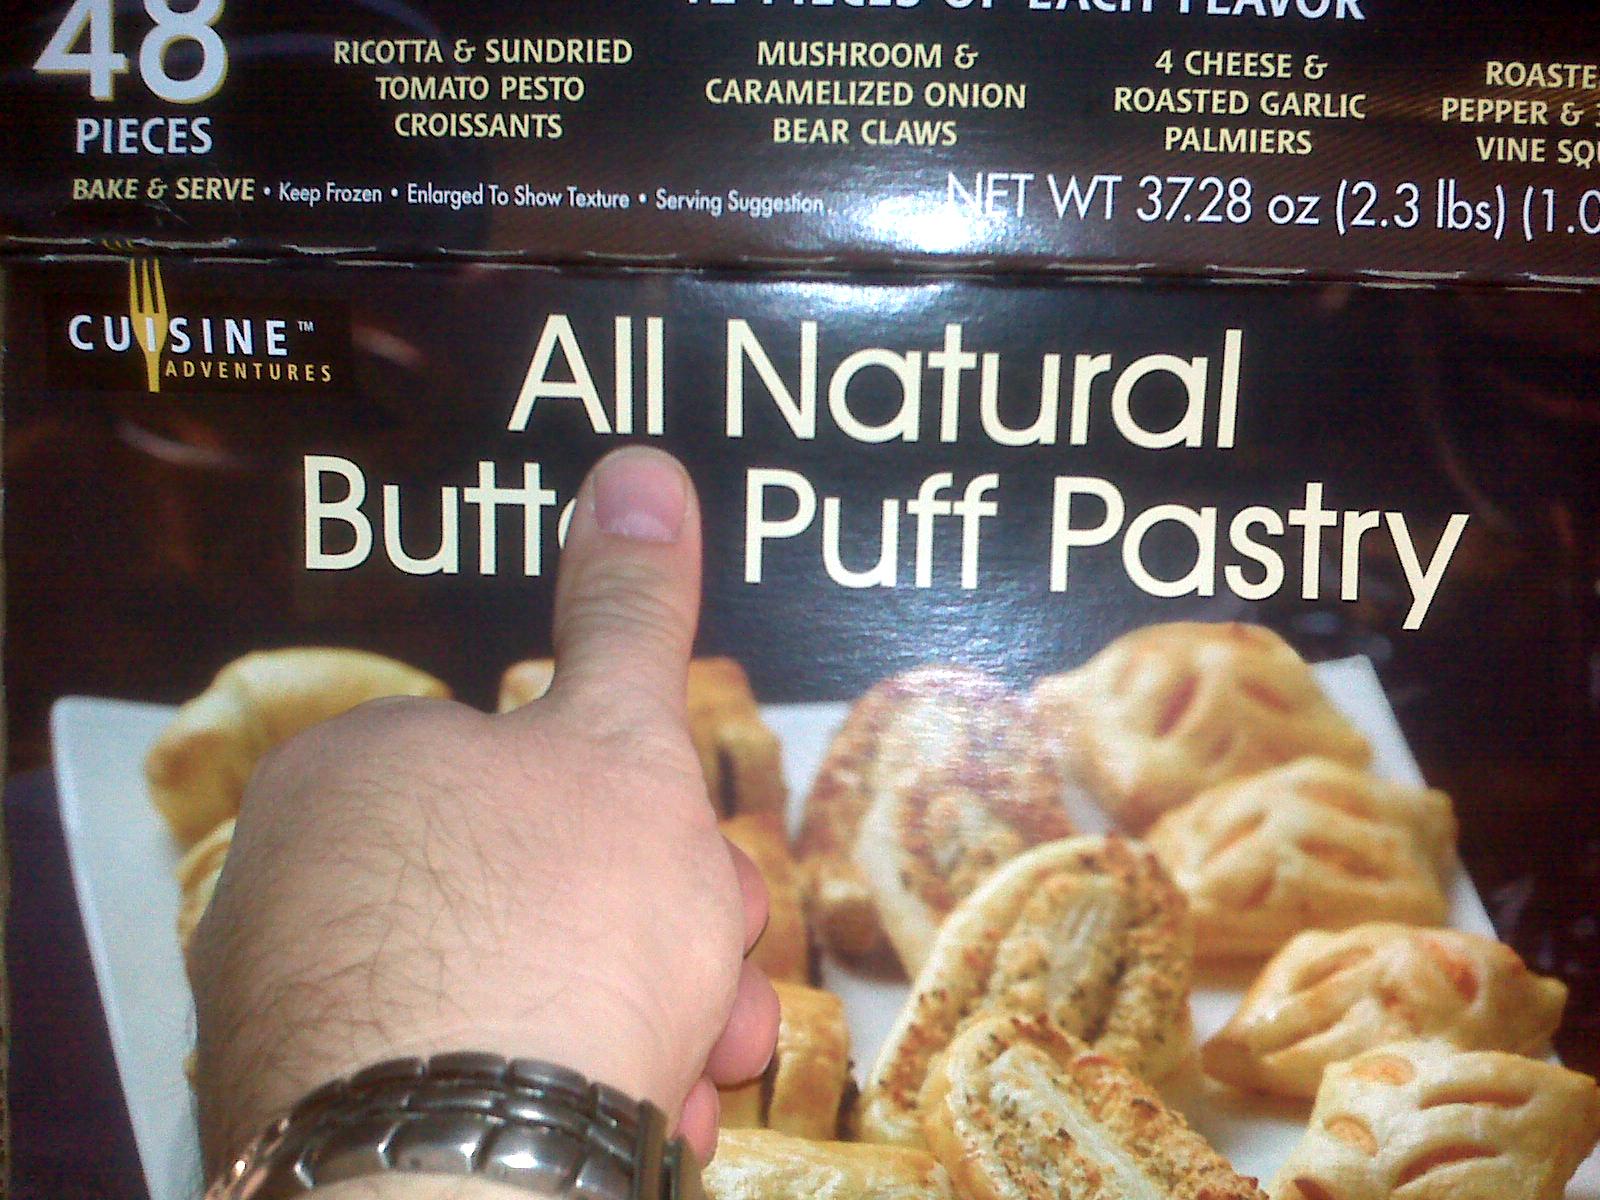 http://pushbutt.com/pushbutt/bradalex-pastry.jpg